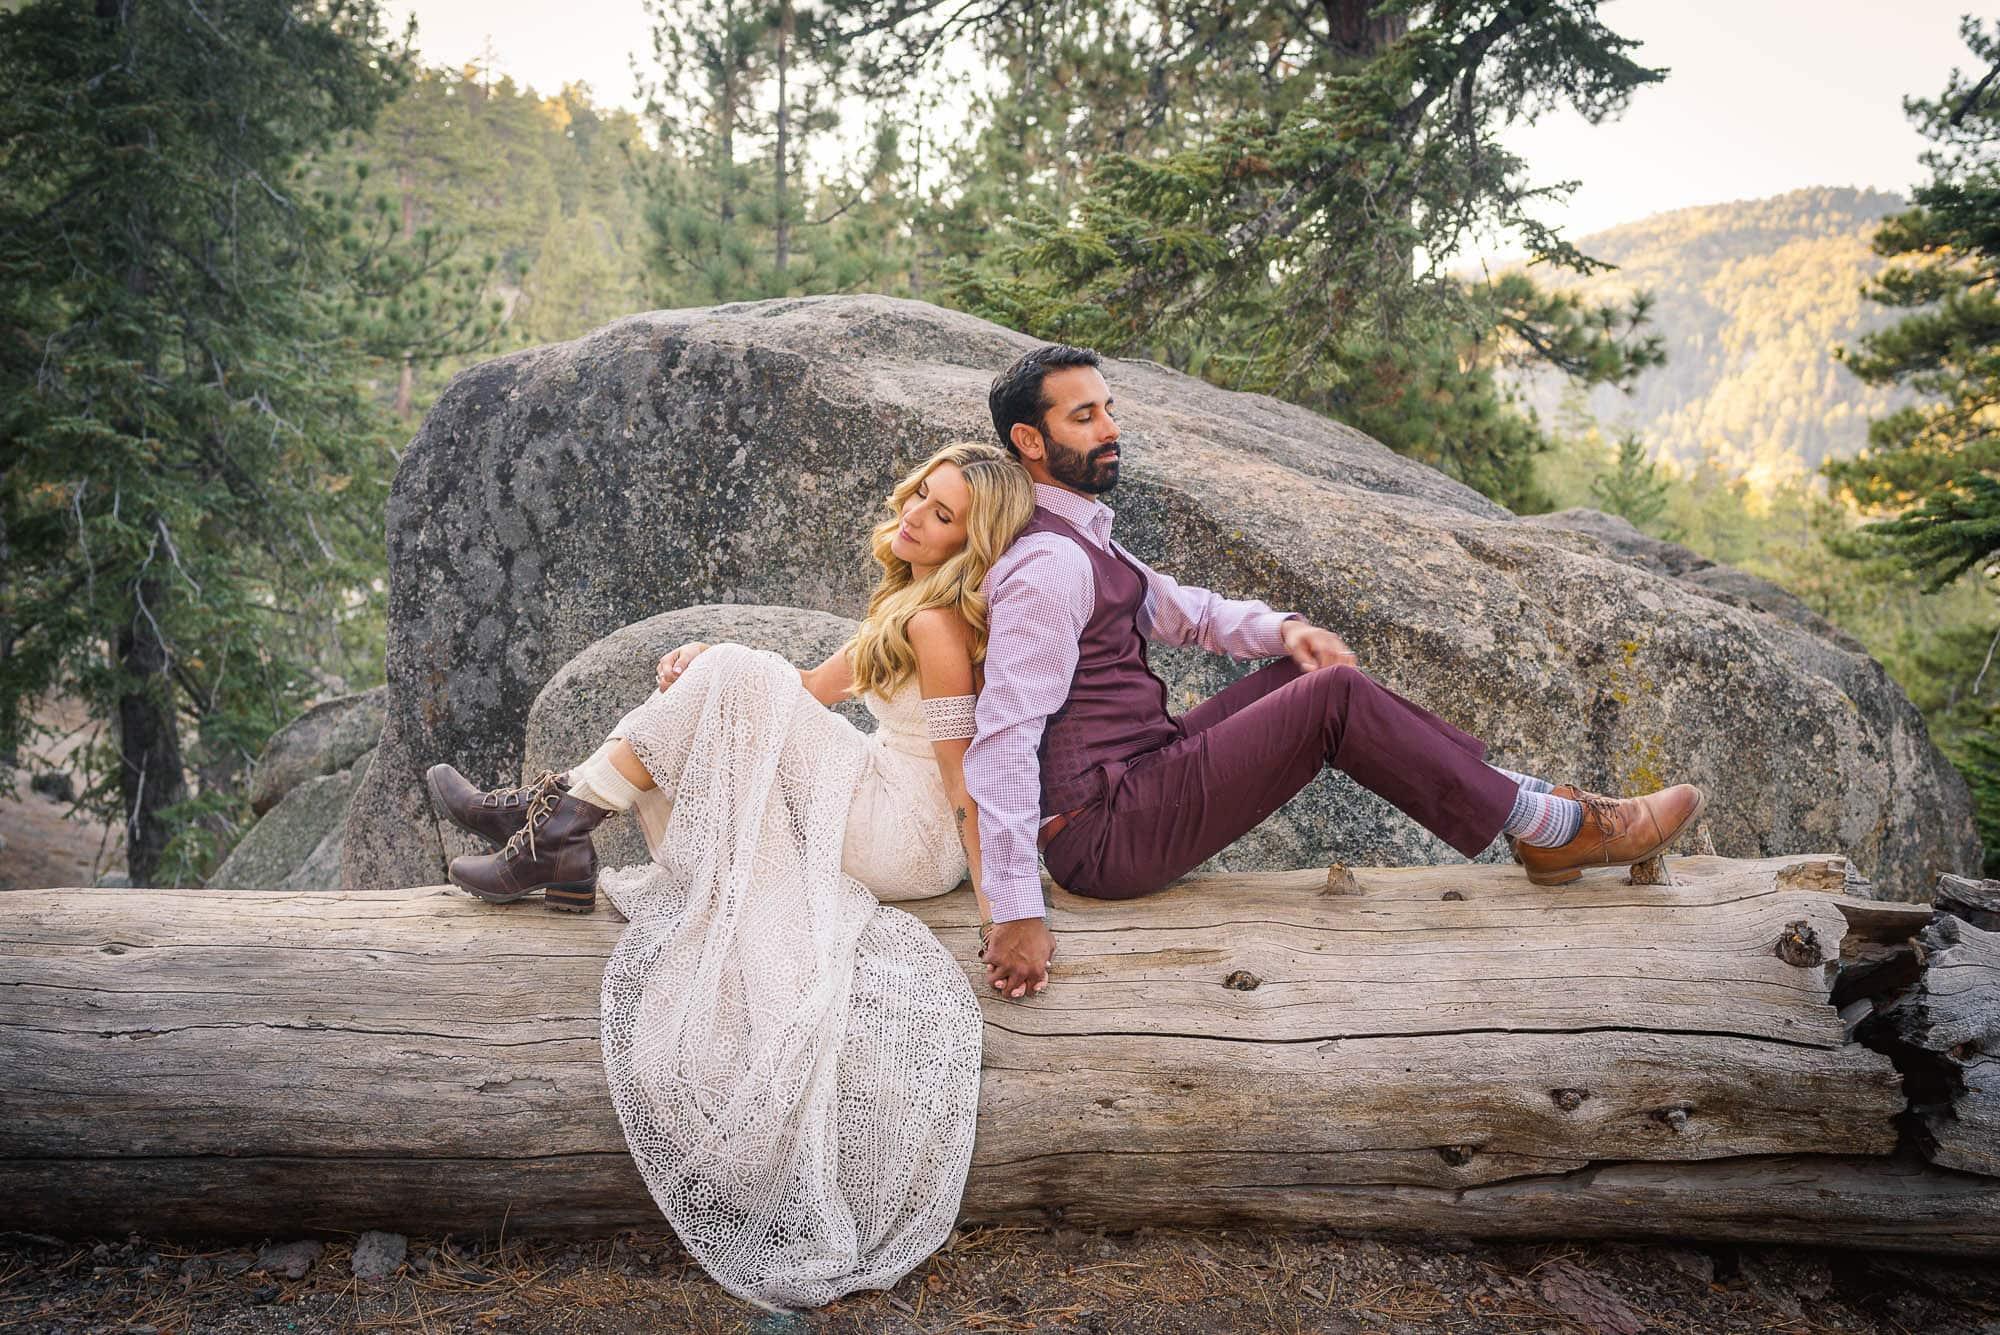 039_Alan_and_Heidi_Wedding_Natalie_Mike